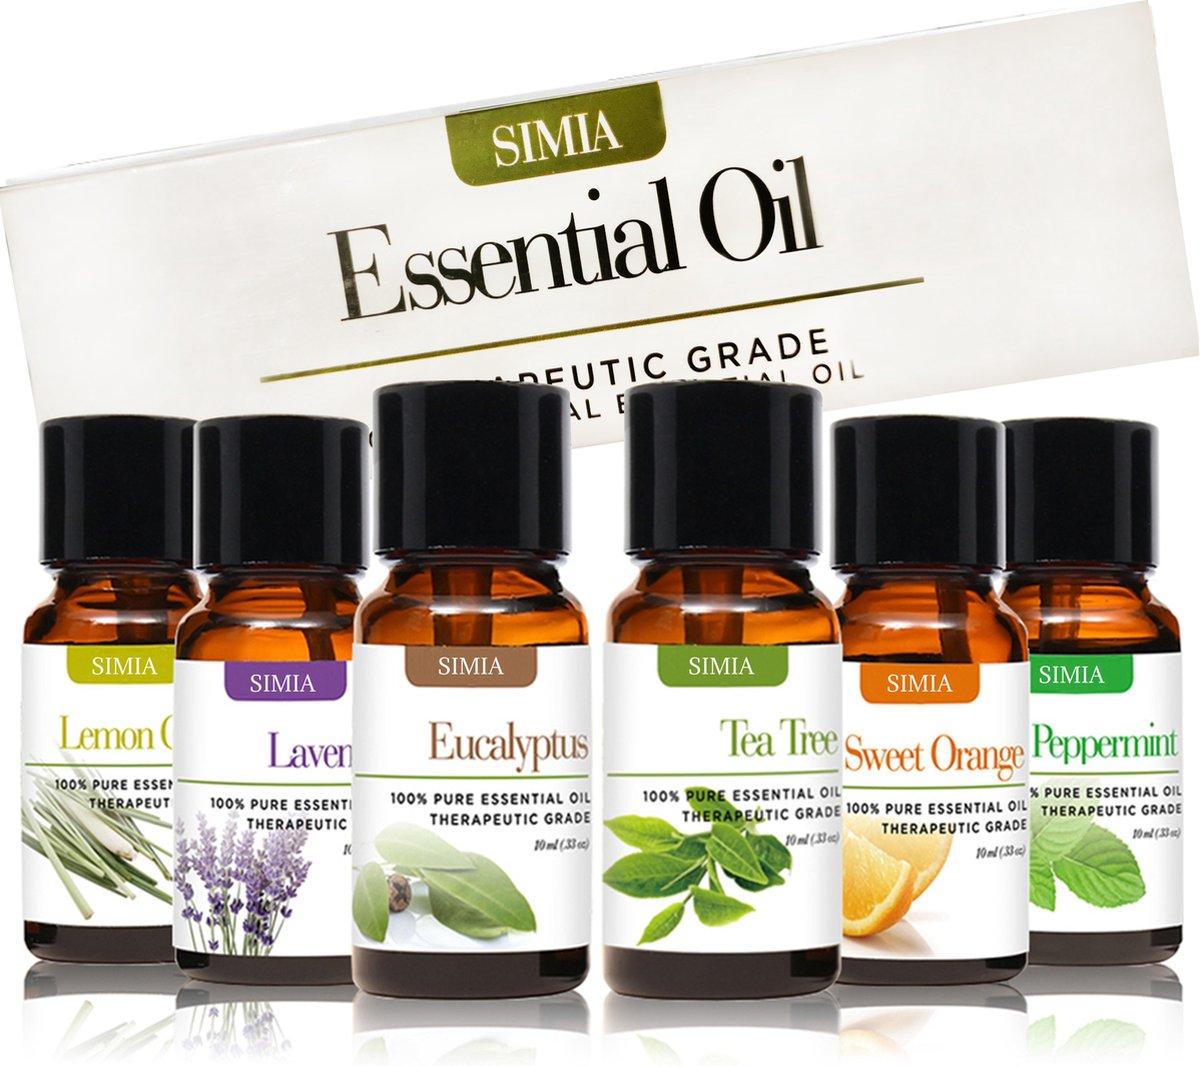 SIMIA Premium Essentiële Oliën Set 100% Natuurlijk - Aromatherapie - olie voor aroma diffuser - 6 x